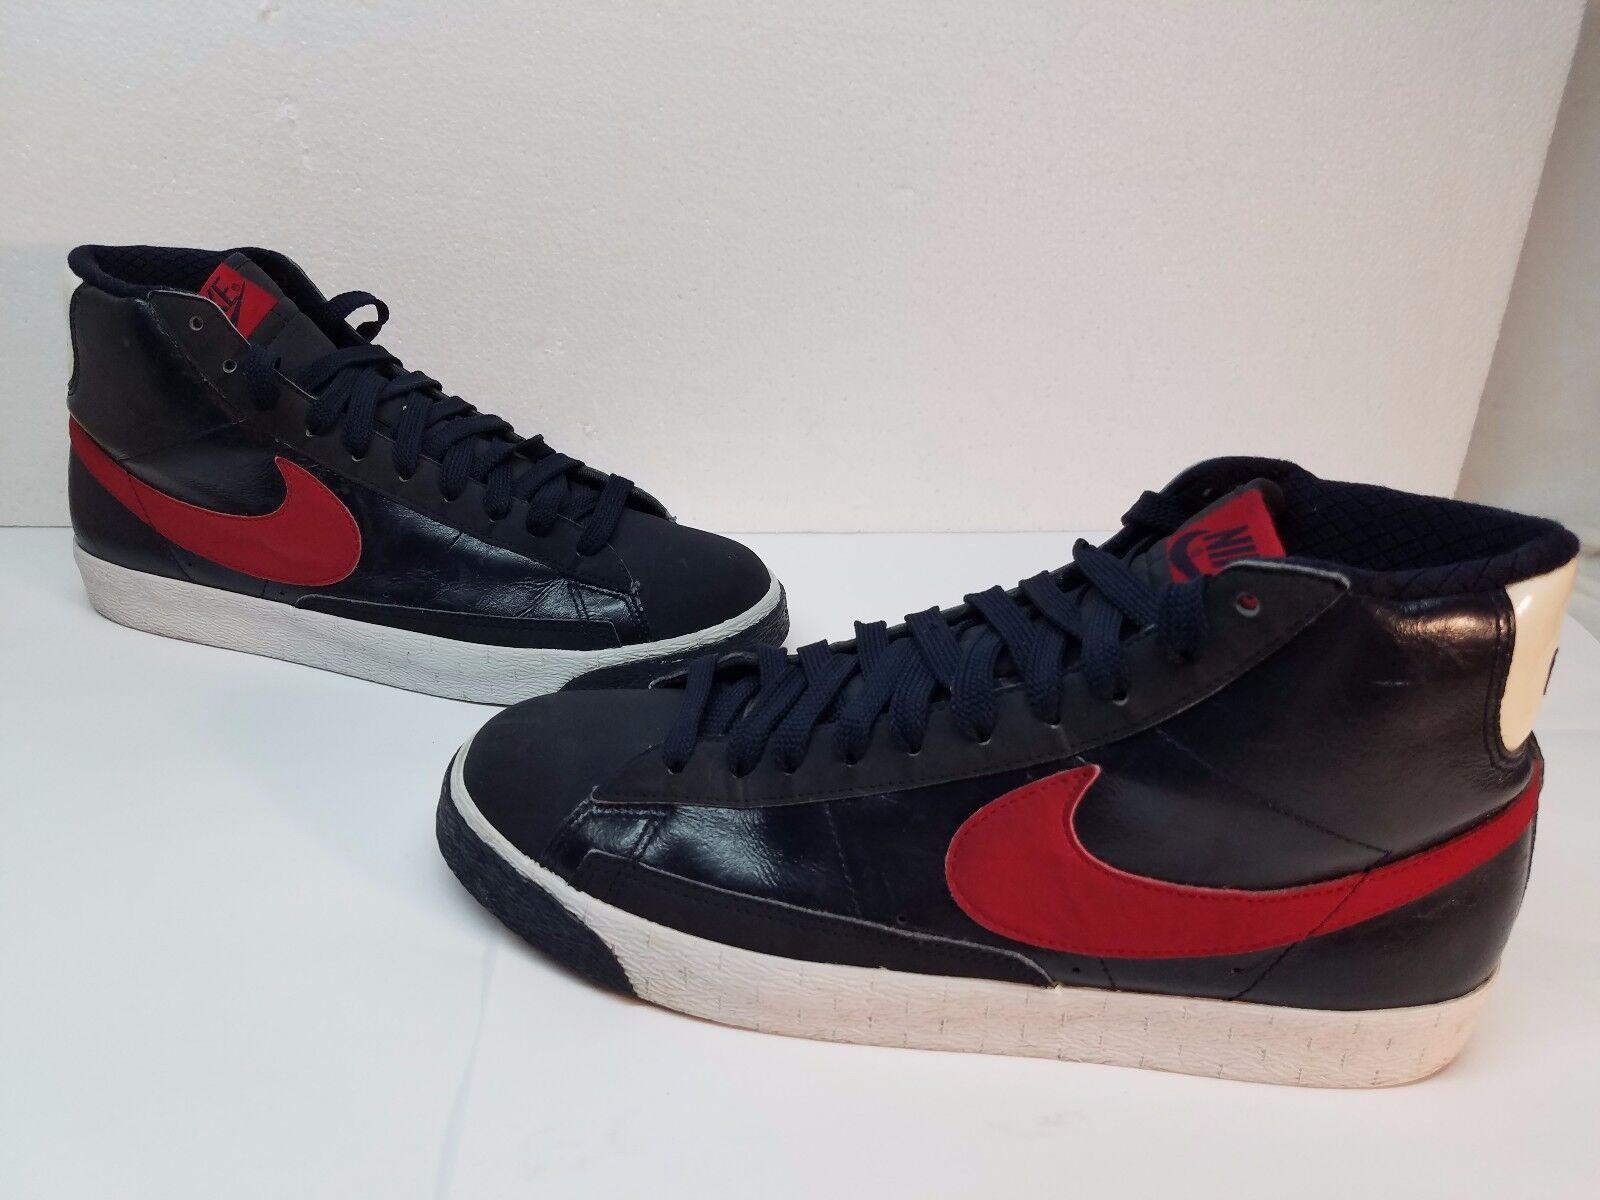 f17d41fb8a Nike Black Hi Top Top Top with Red Swoosh. 10.5 Men's, very clean b7819d